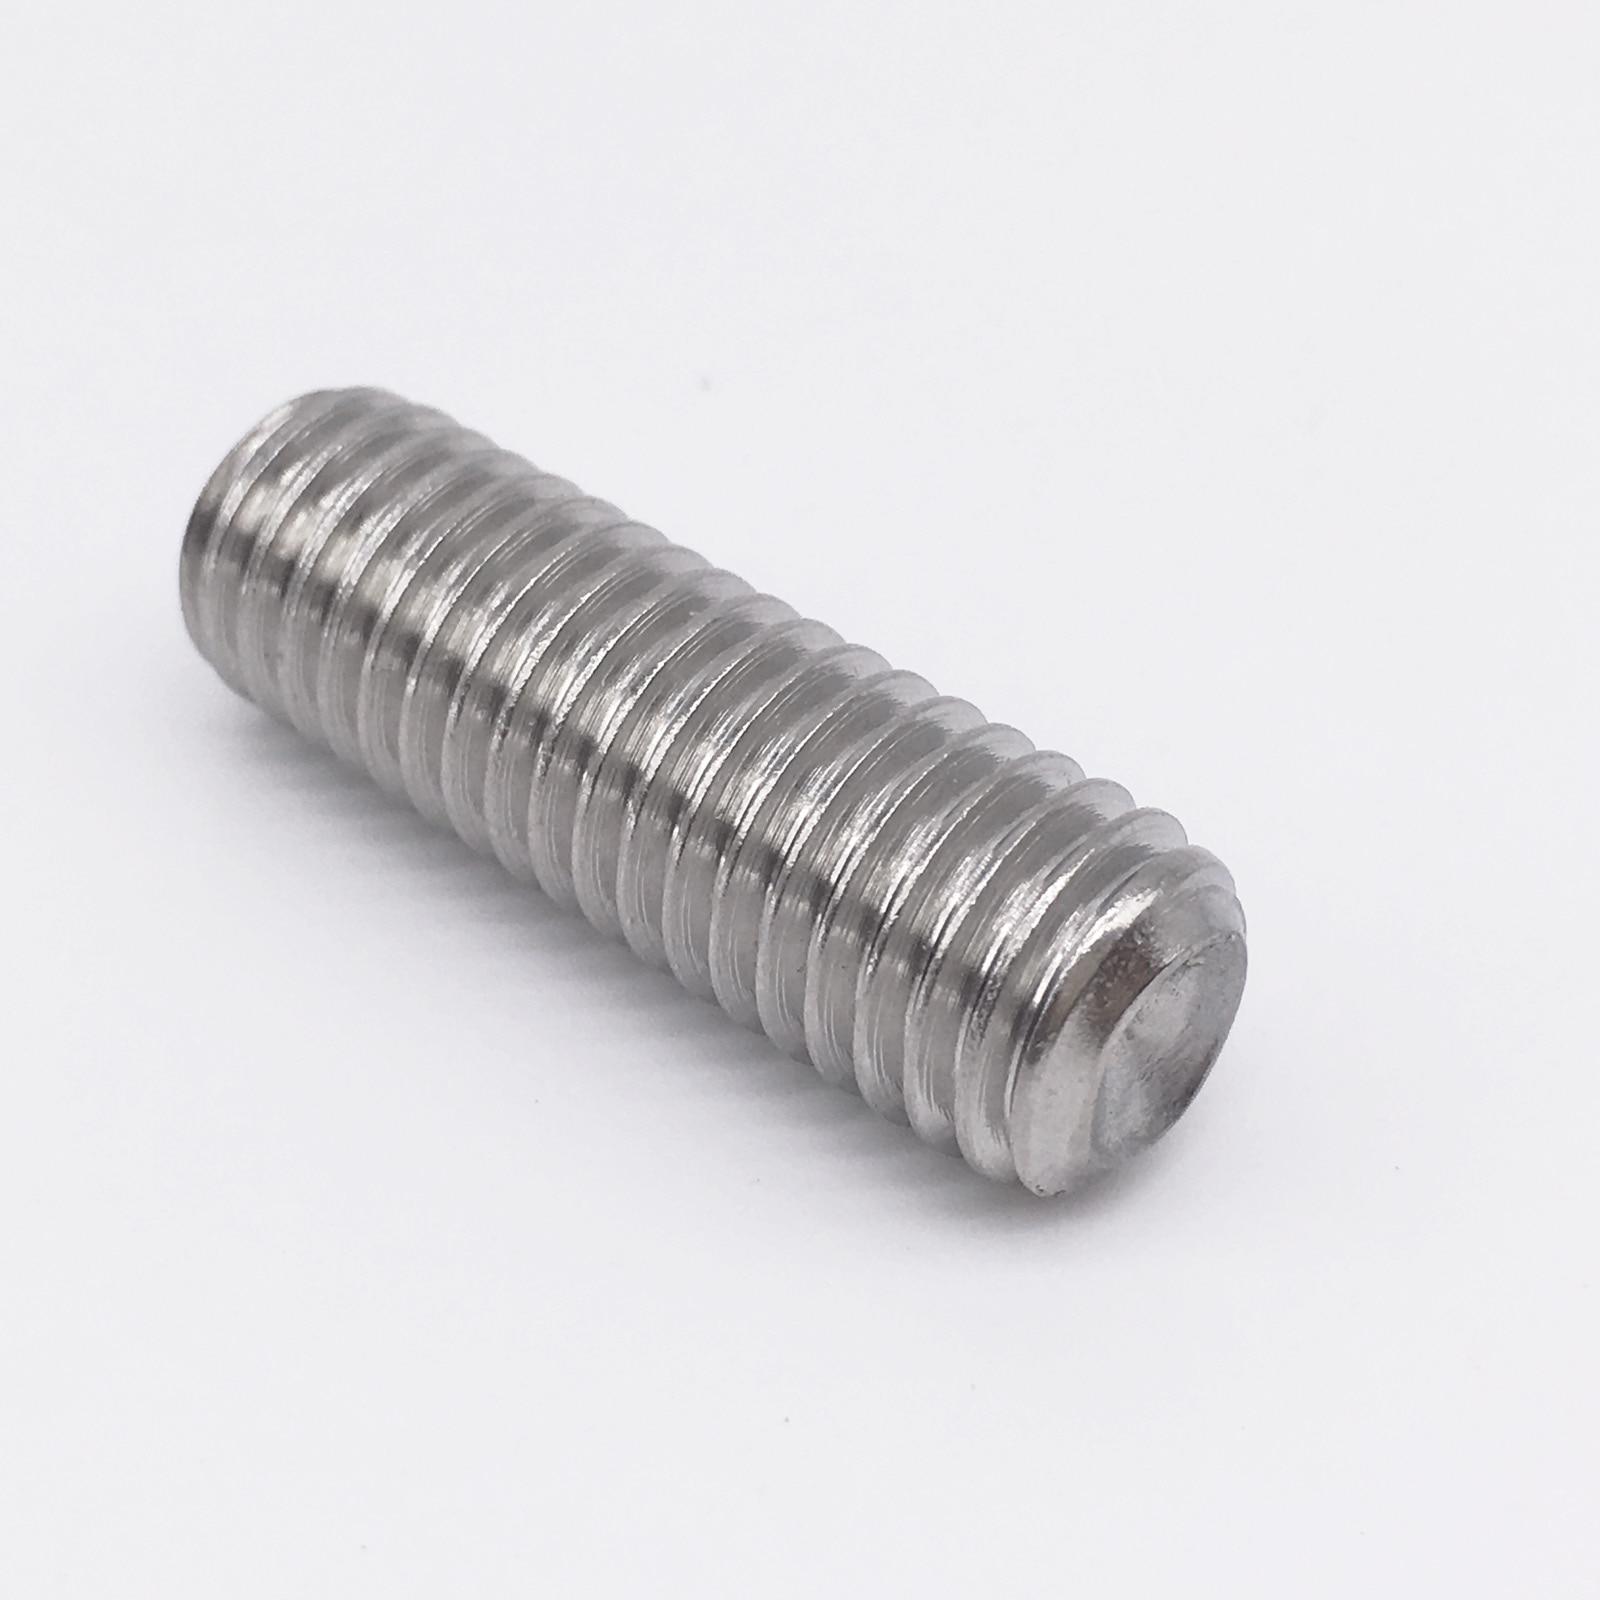 M5 Grub Screw Hex Socket Set Screws Cup Point Stainless Steel m5 grub screws cup point hex socket set screw 12 9 grade alloy steel